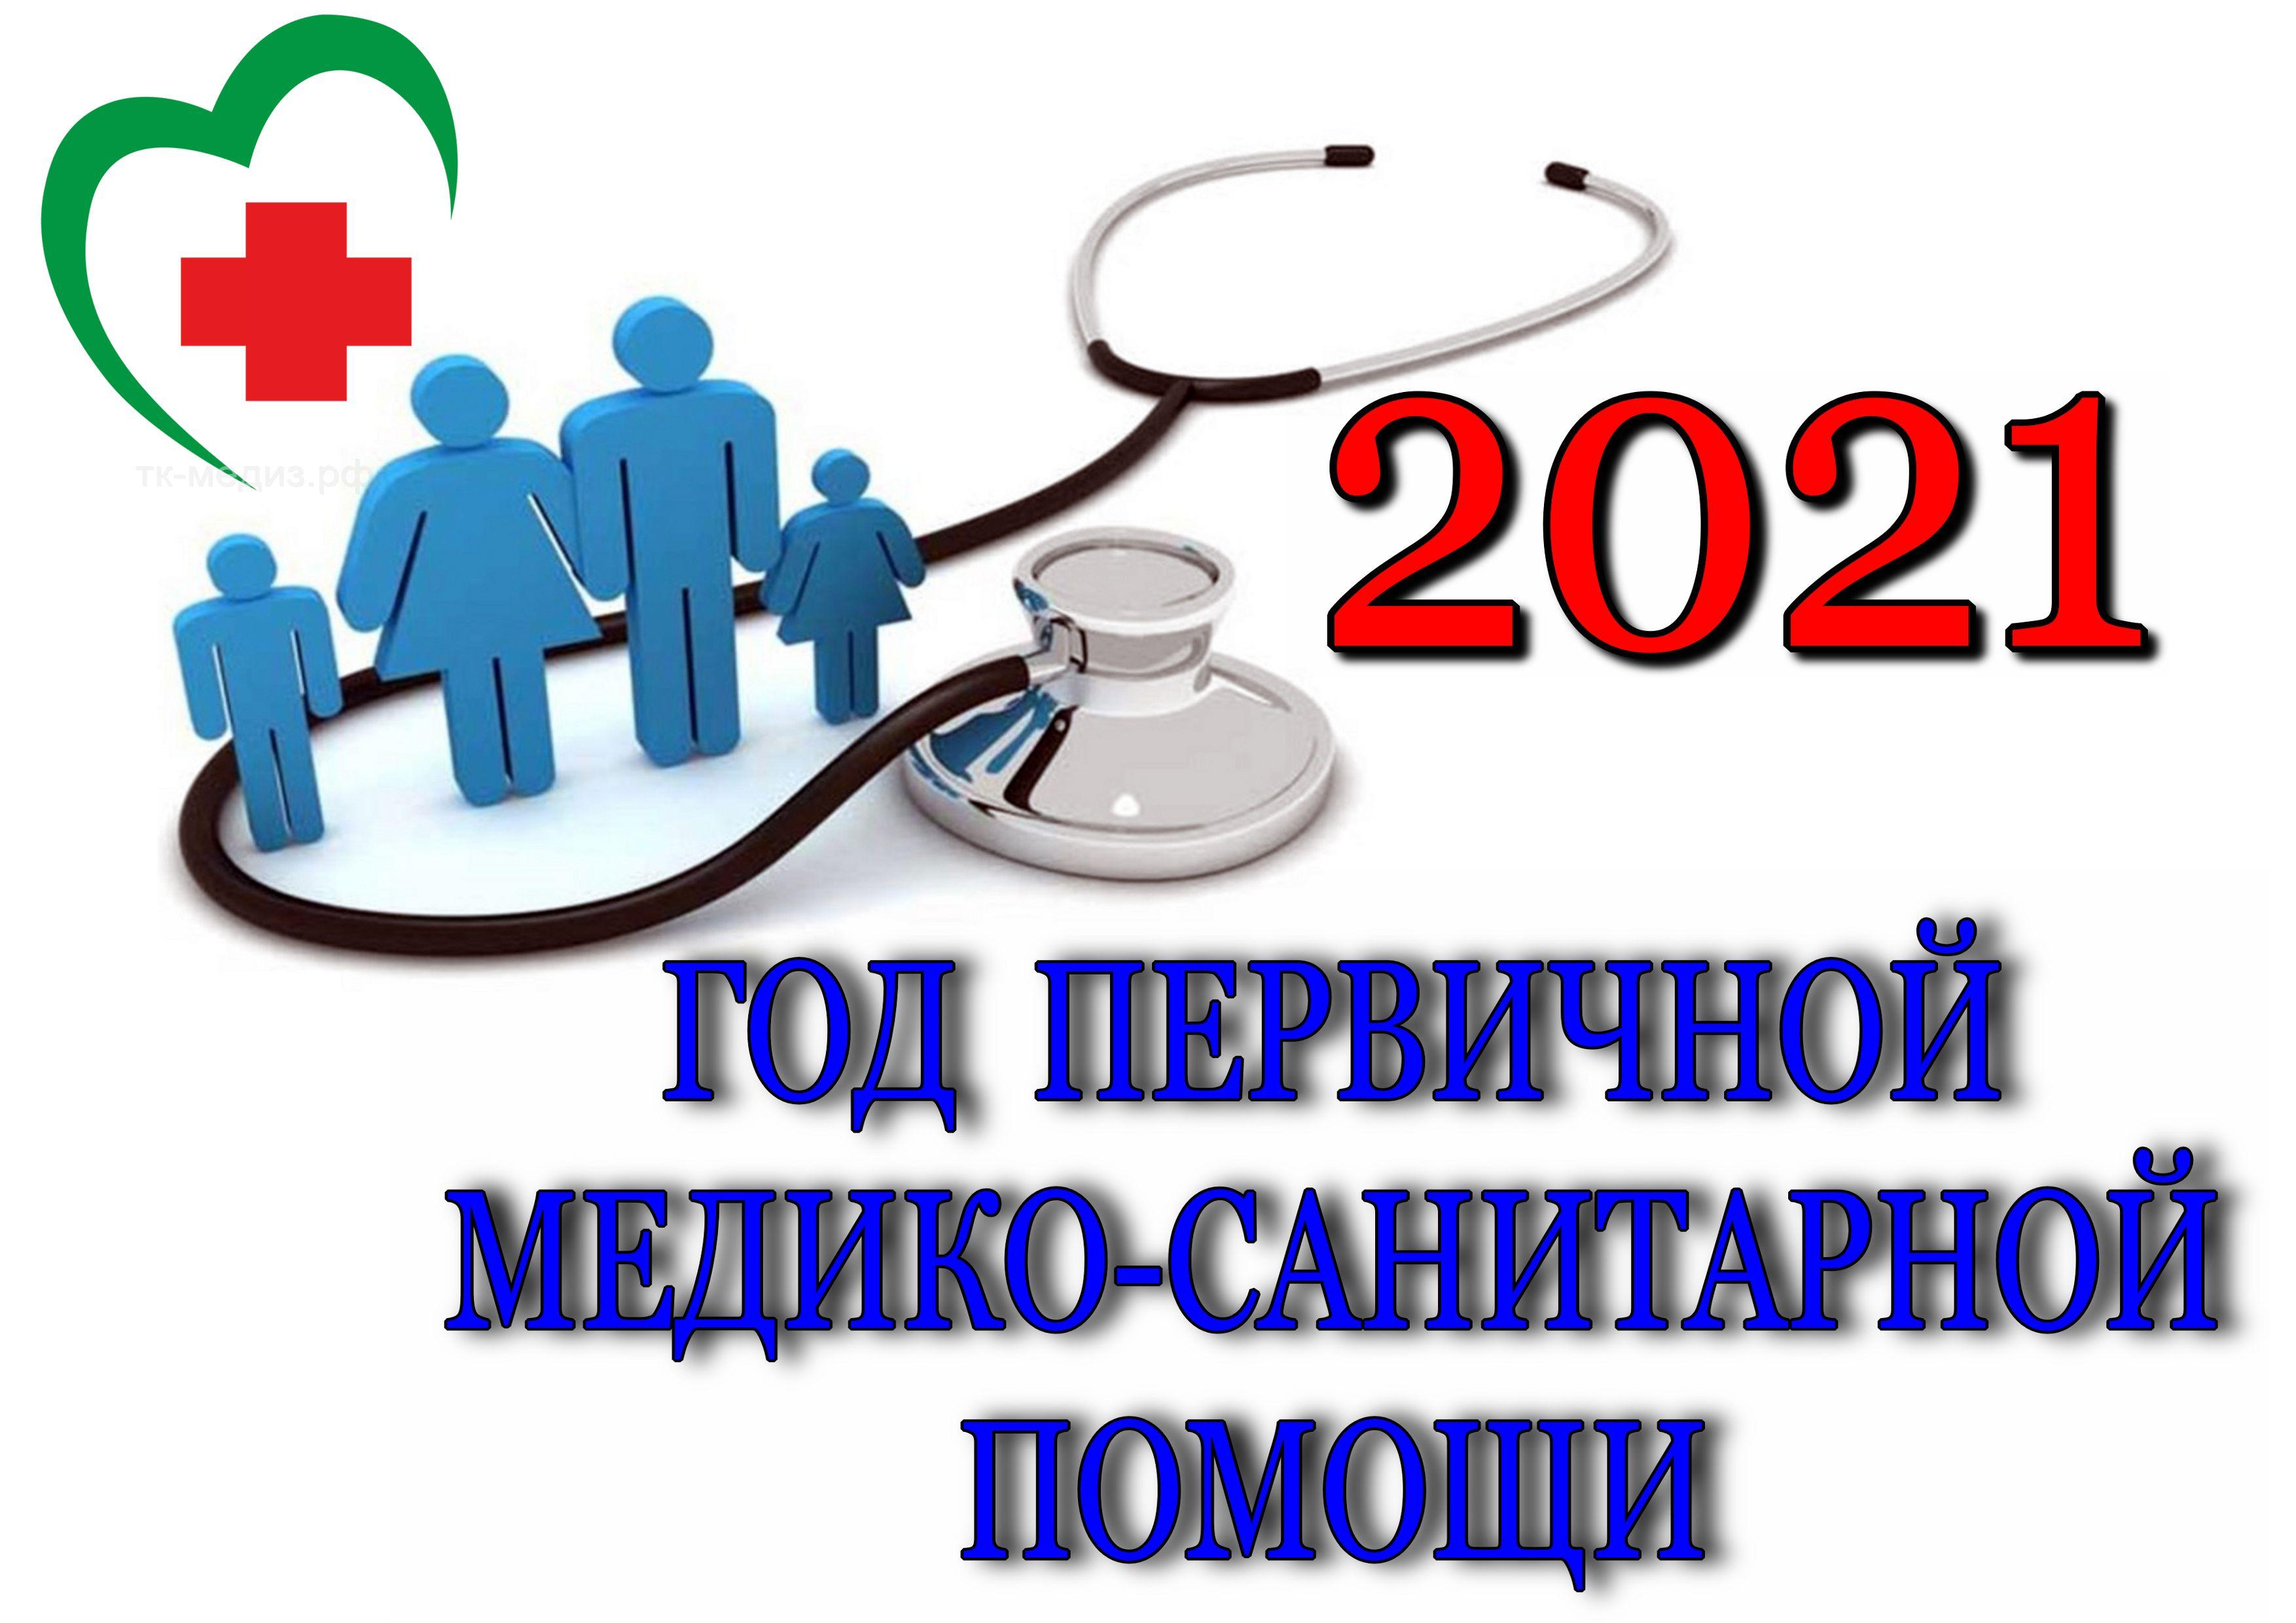 https://www.donland.ru/news/12009/